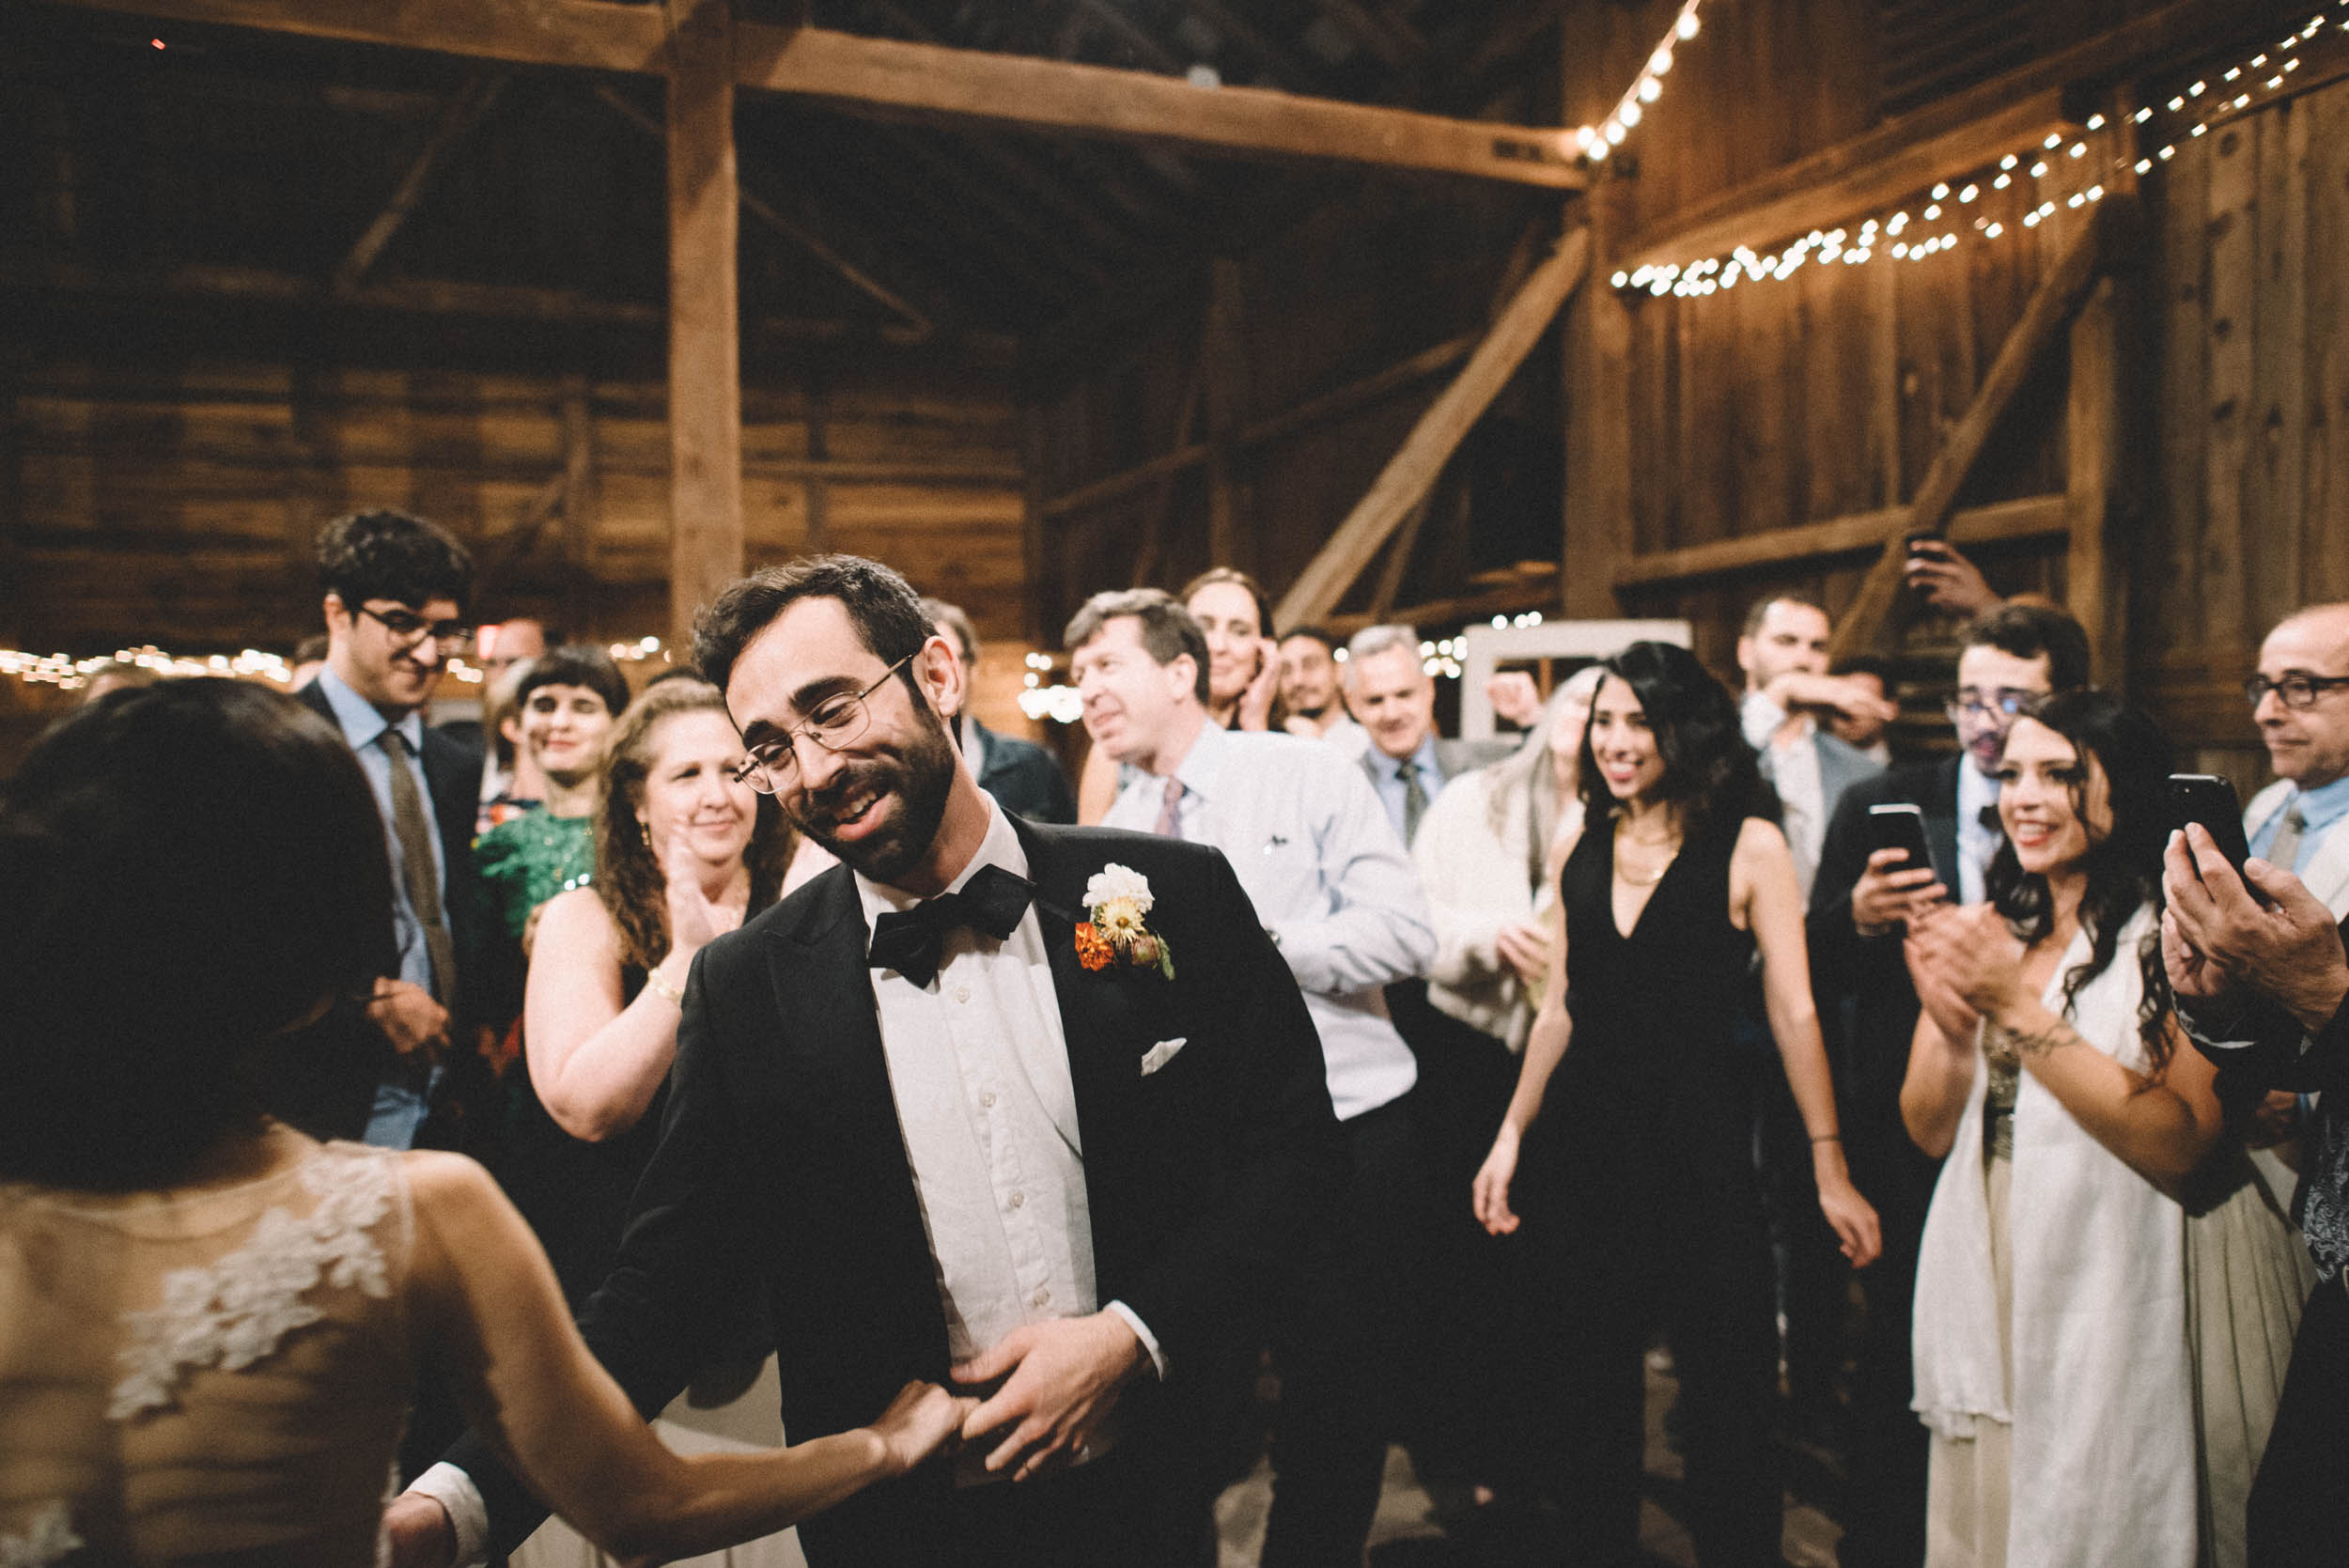 poolseville-maryland-wedding-photographer-73.jpg